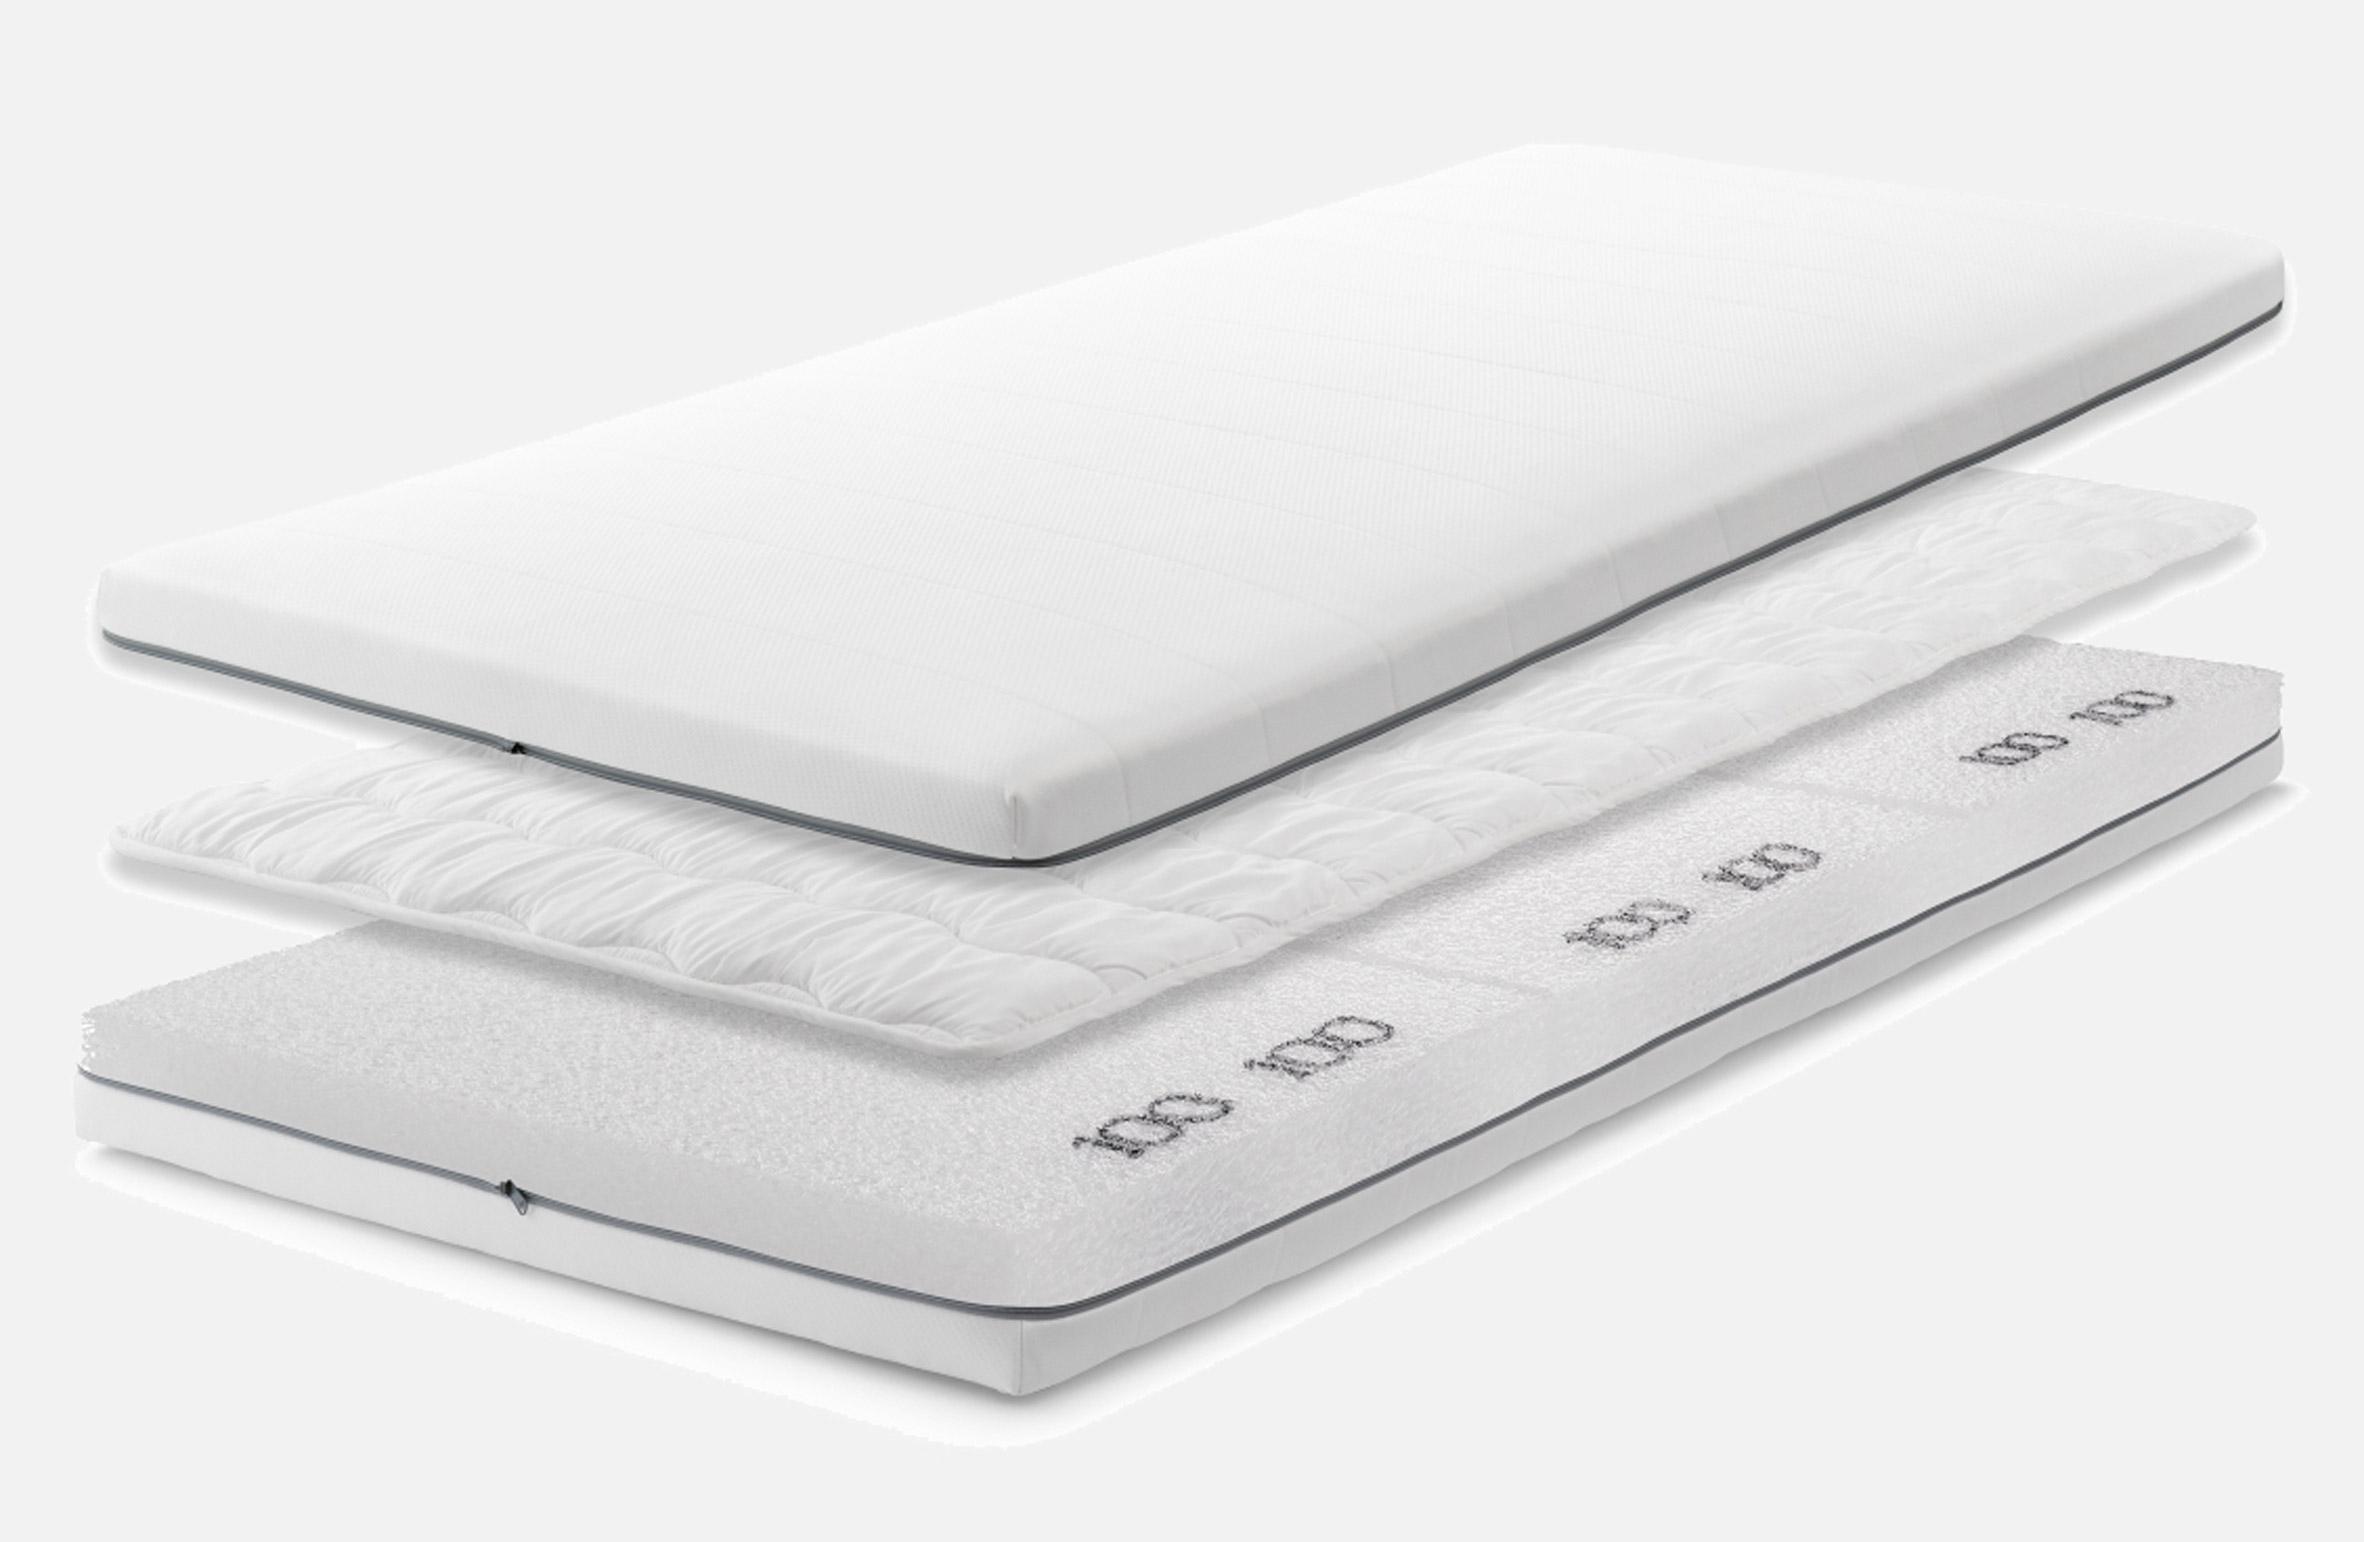 Three parts of the Airweave mattress